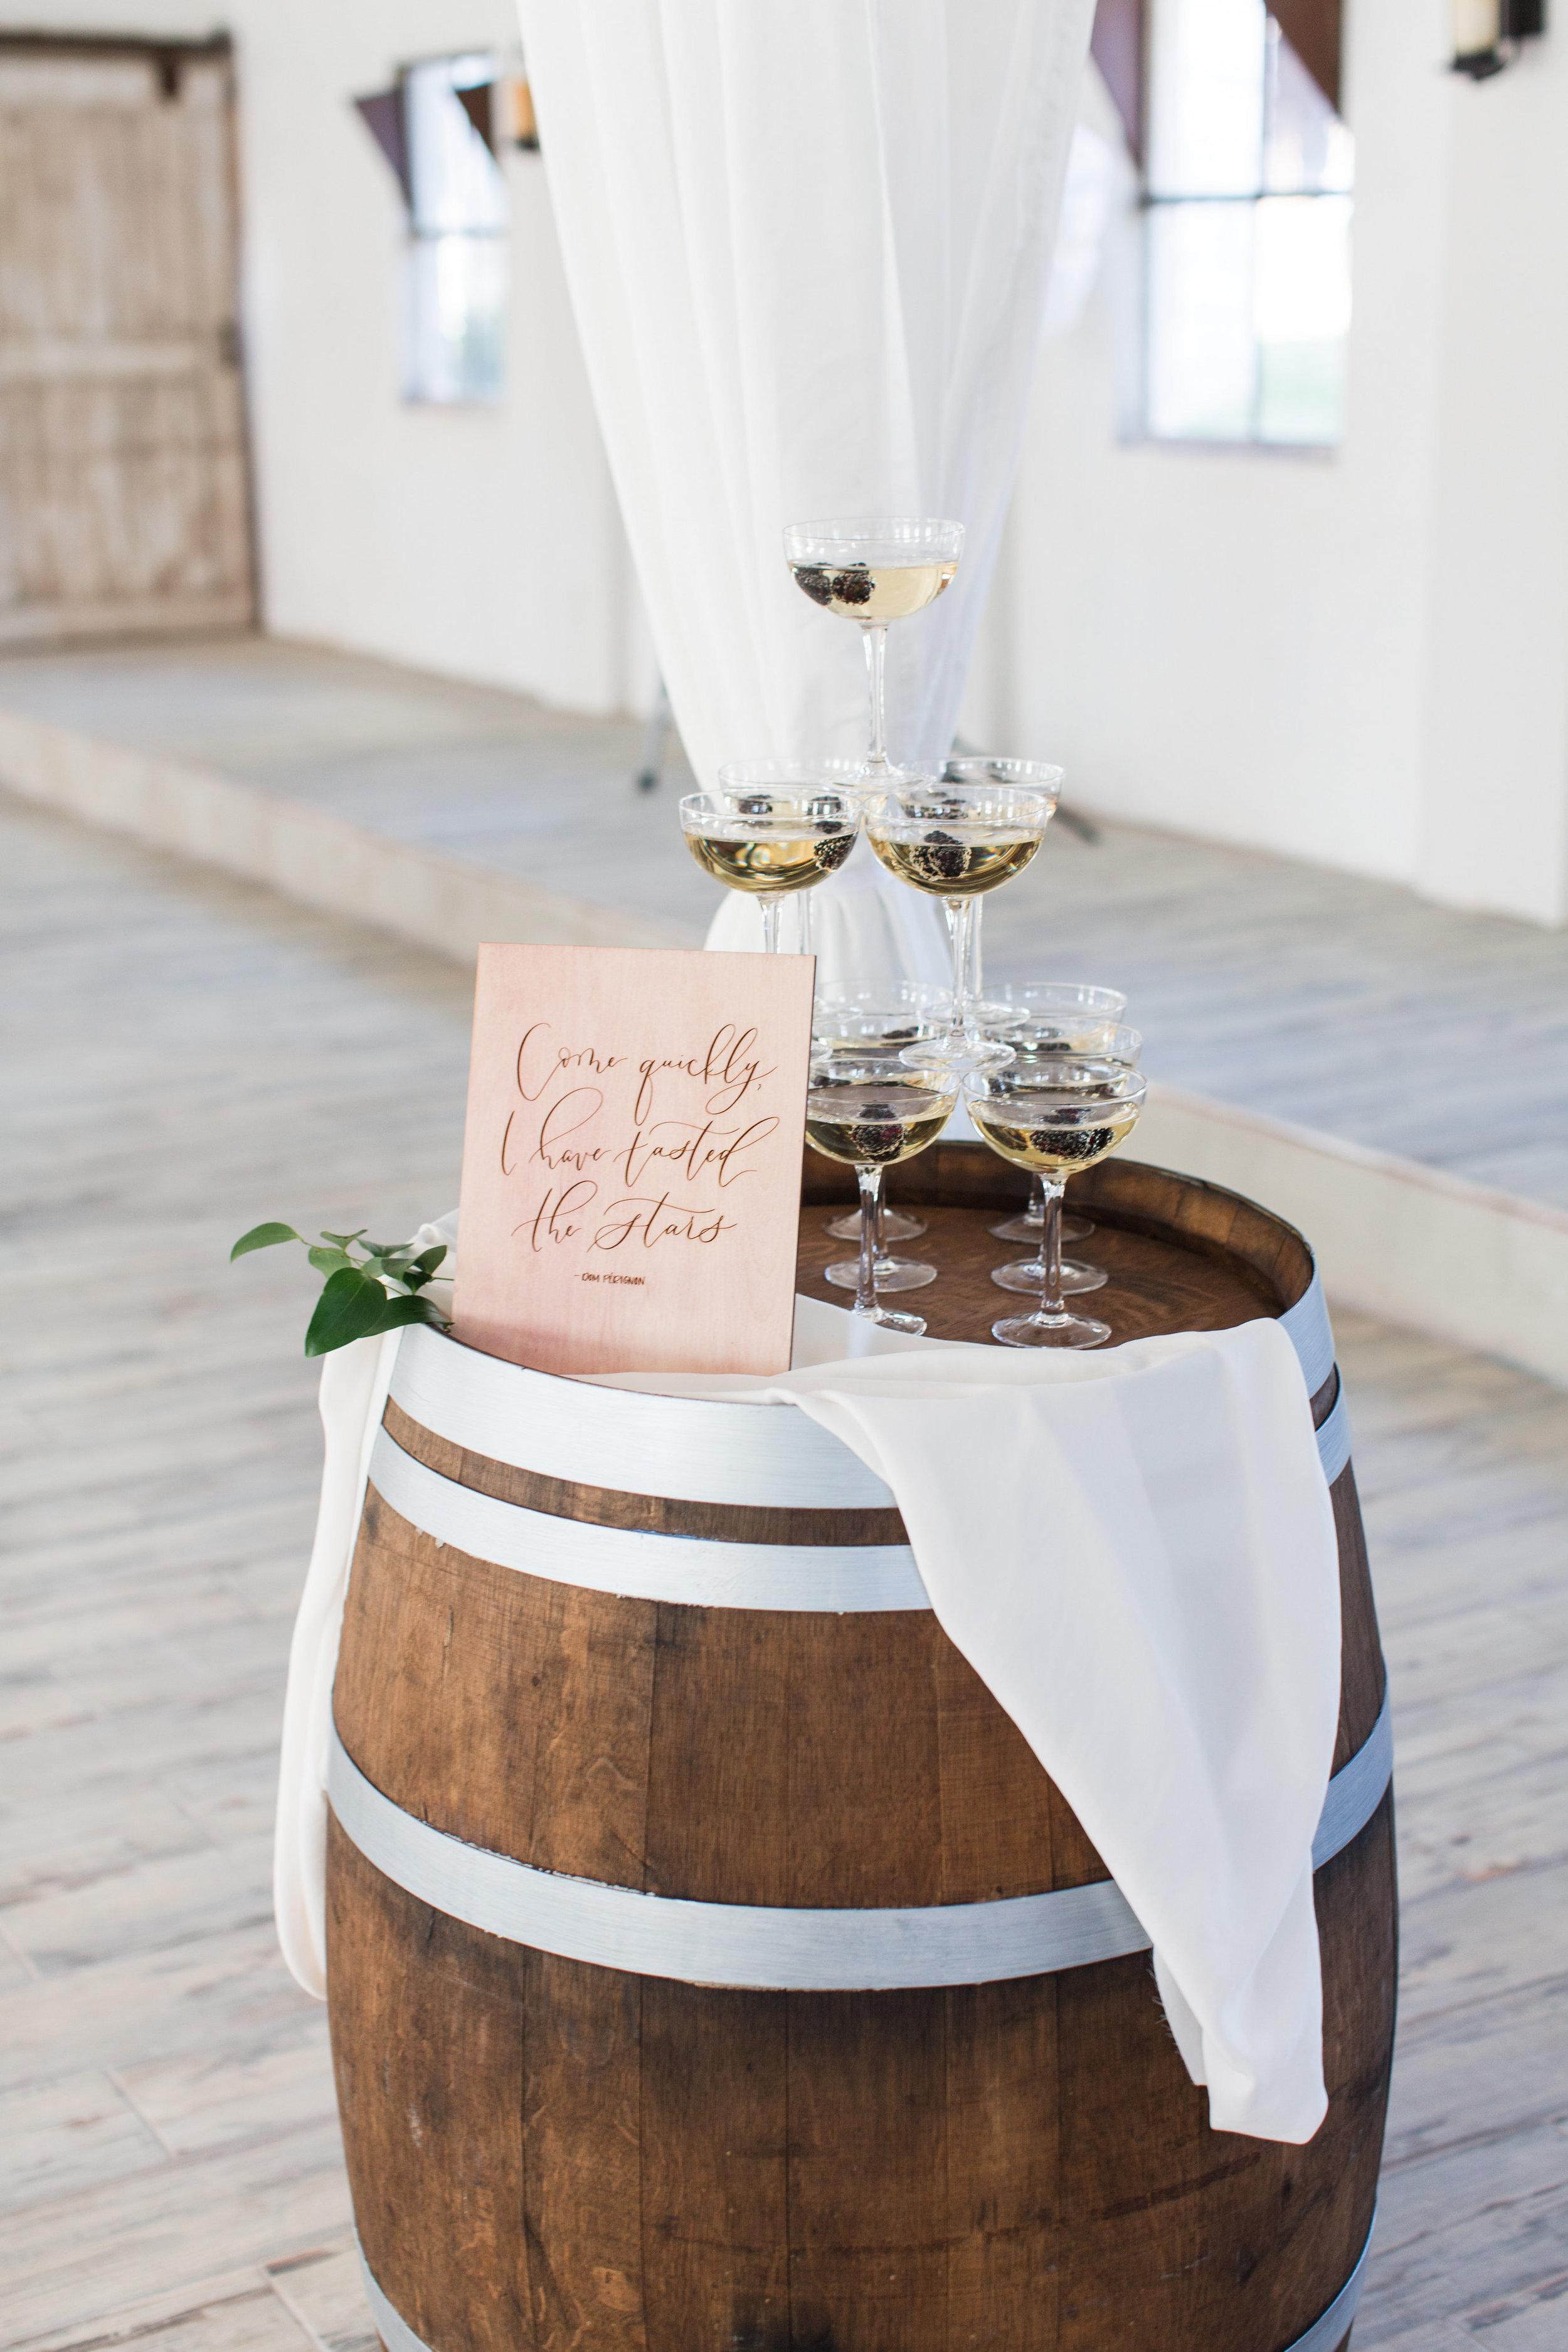 Wine barrel at wedding in Leesburg, VA